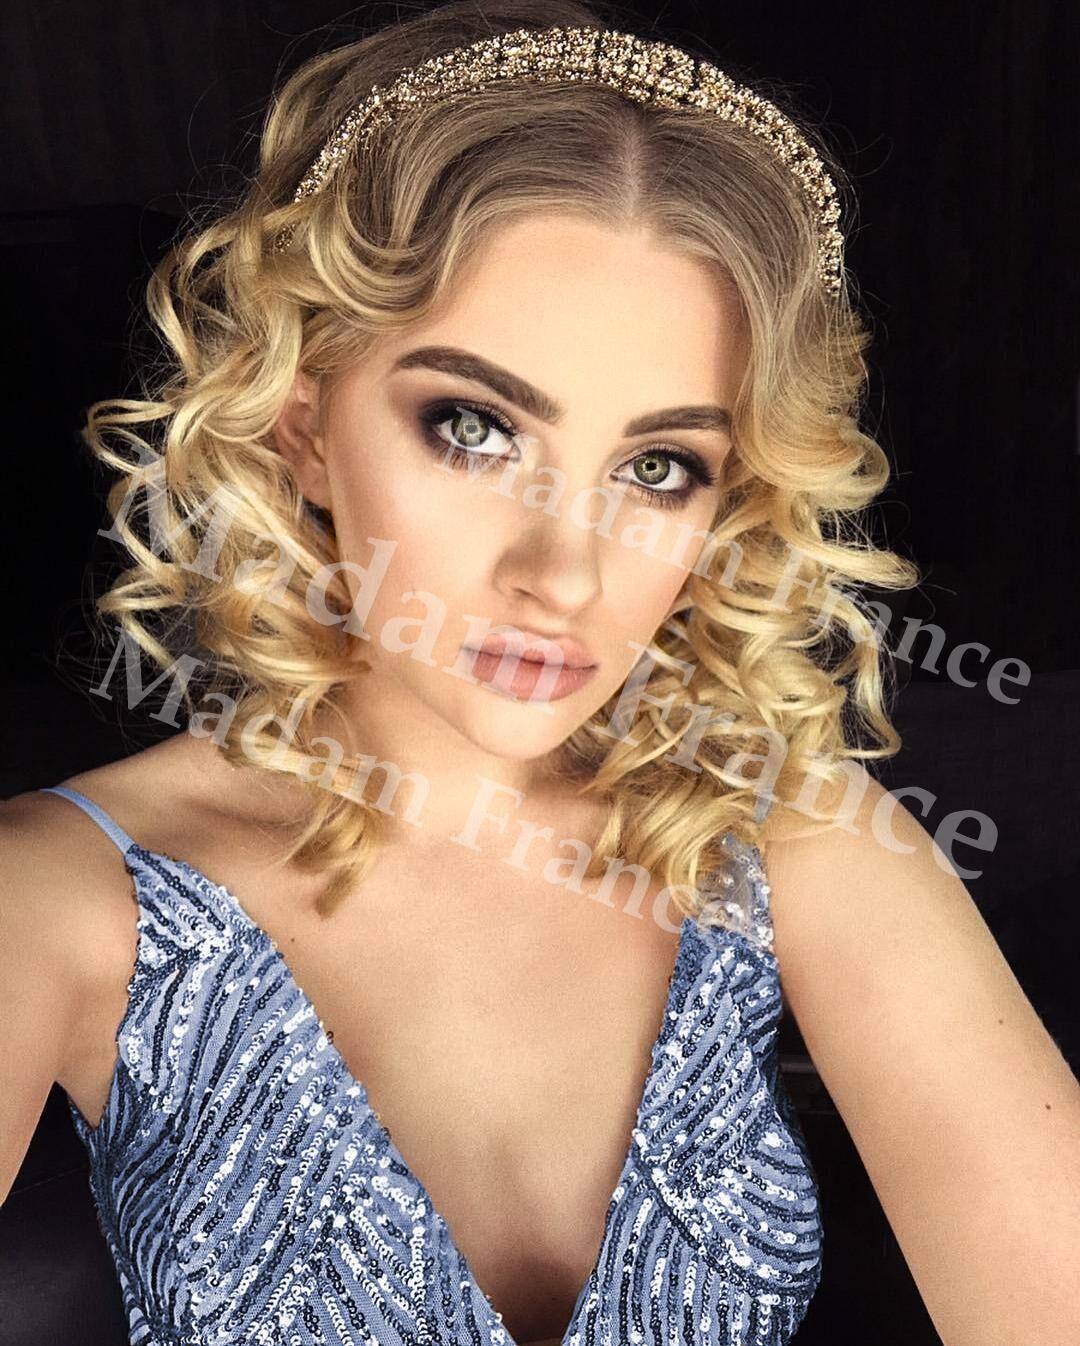 Joanna model on Madam France escort service